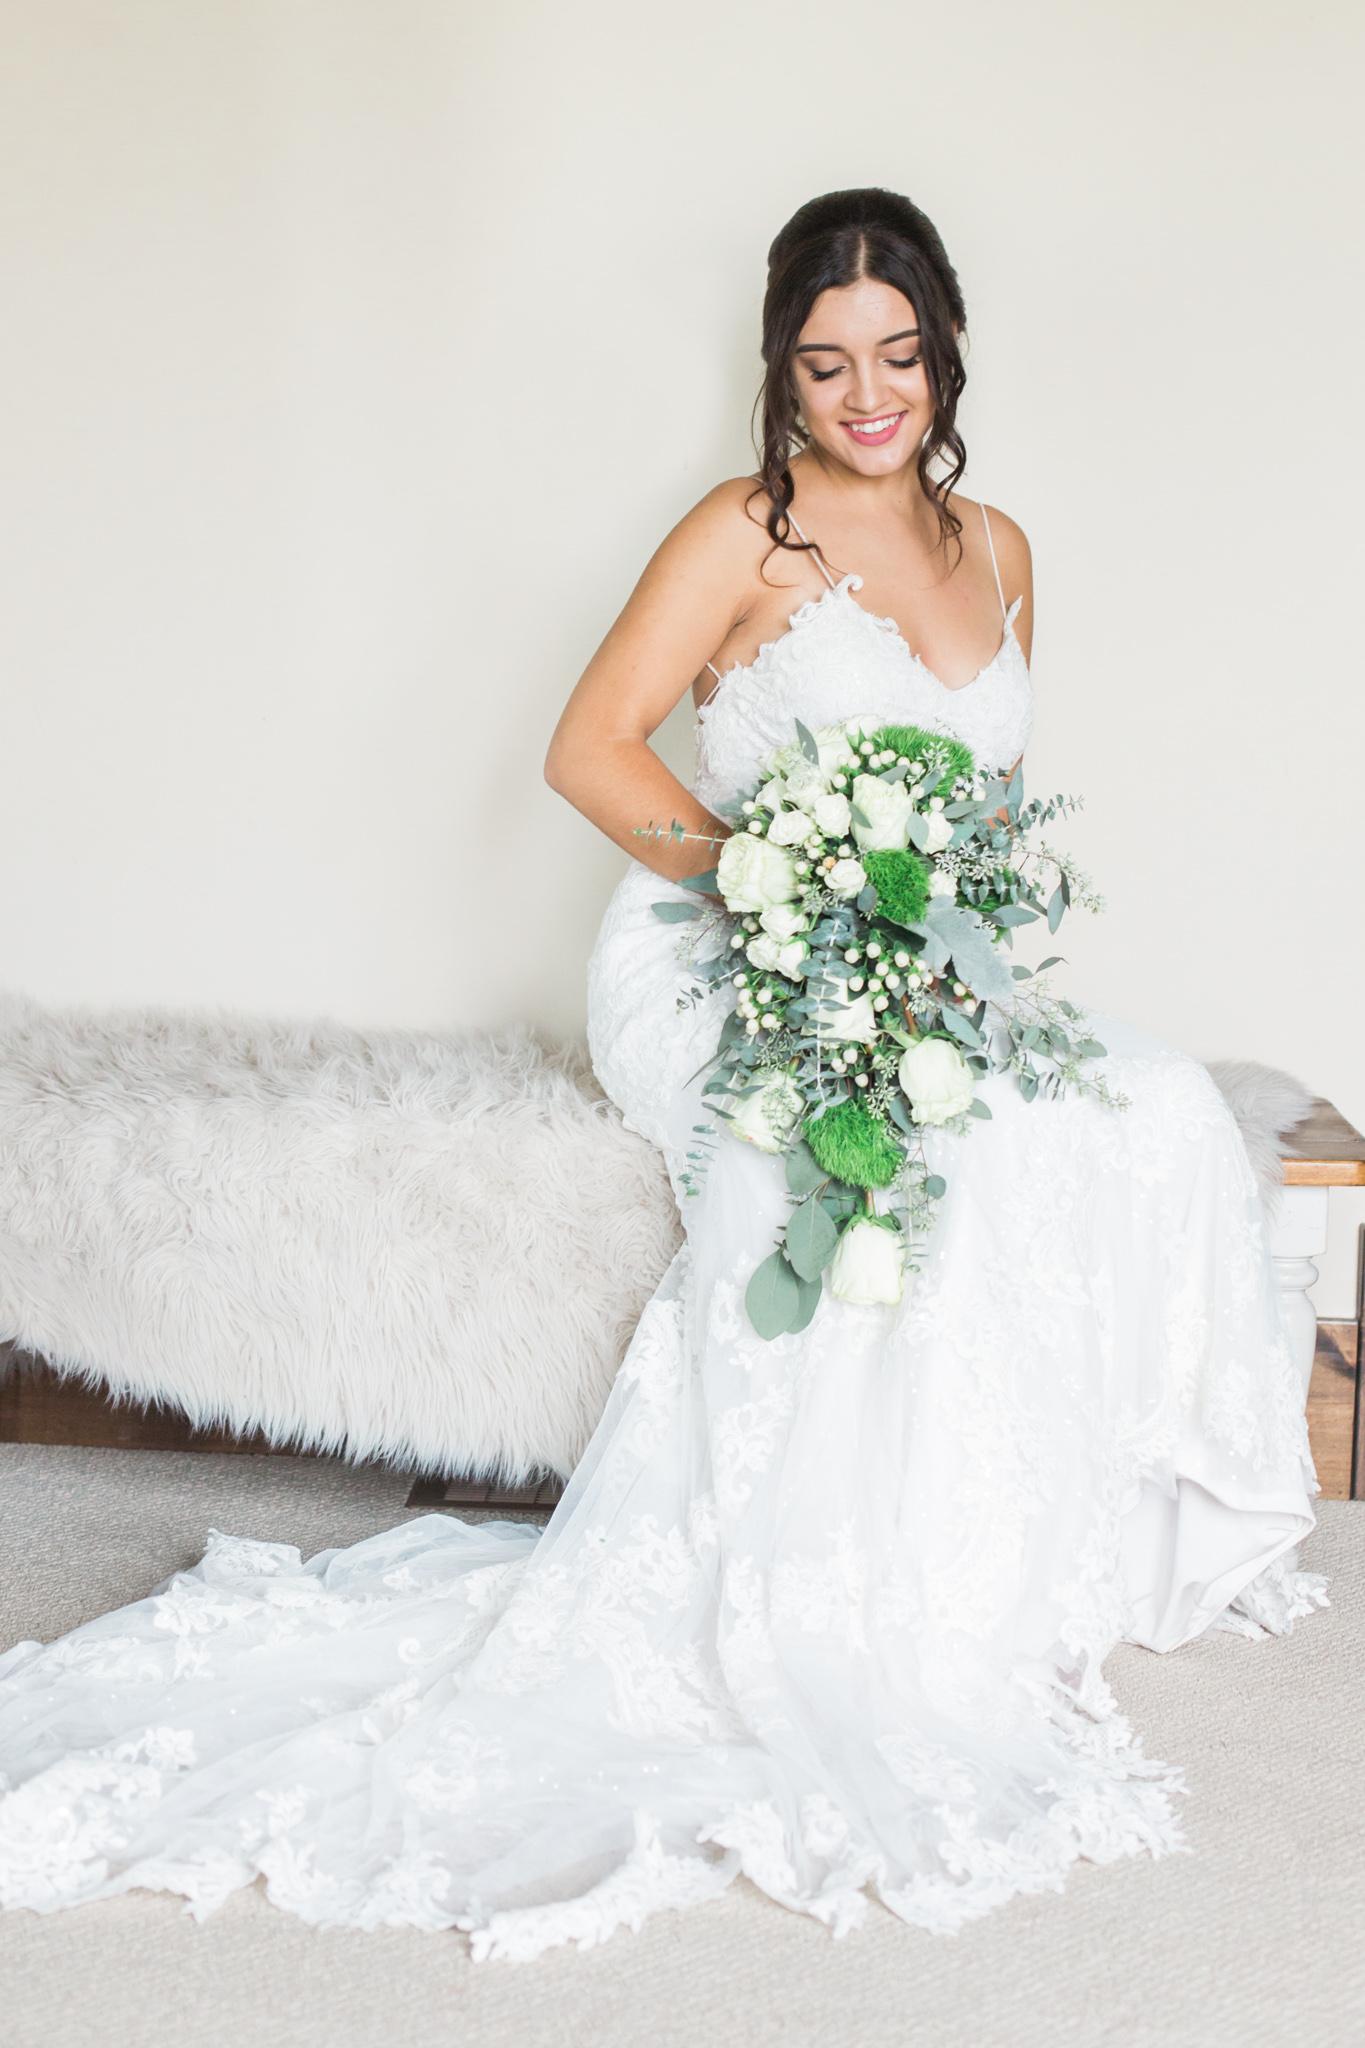 Olga_janni_wedding_090917_WEBSIZE (113 of 704).JPG